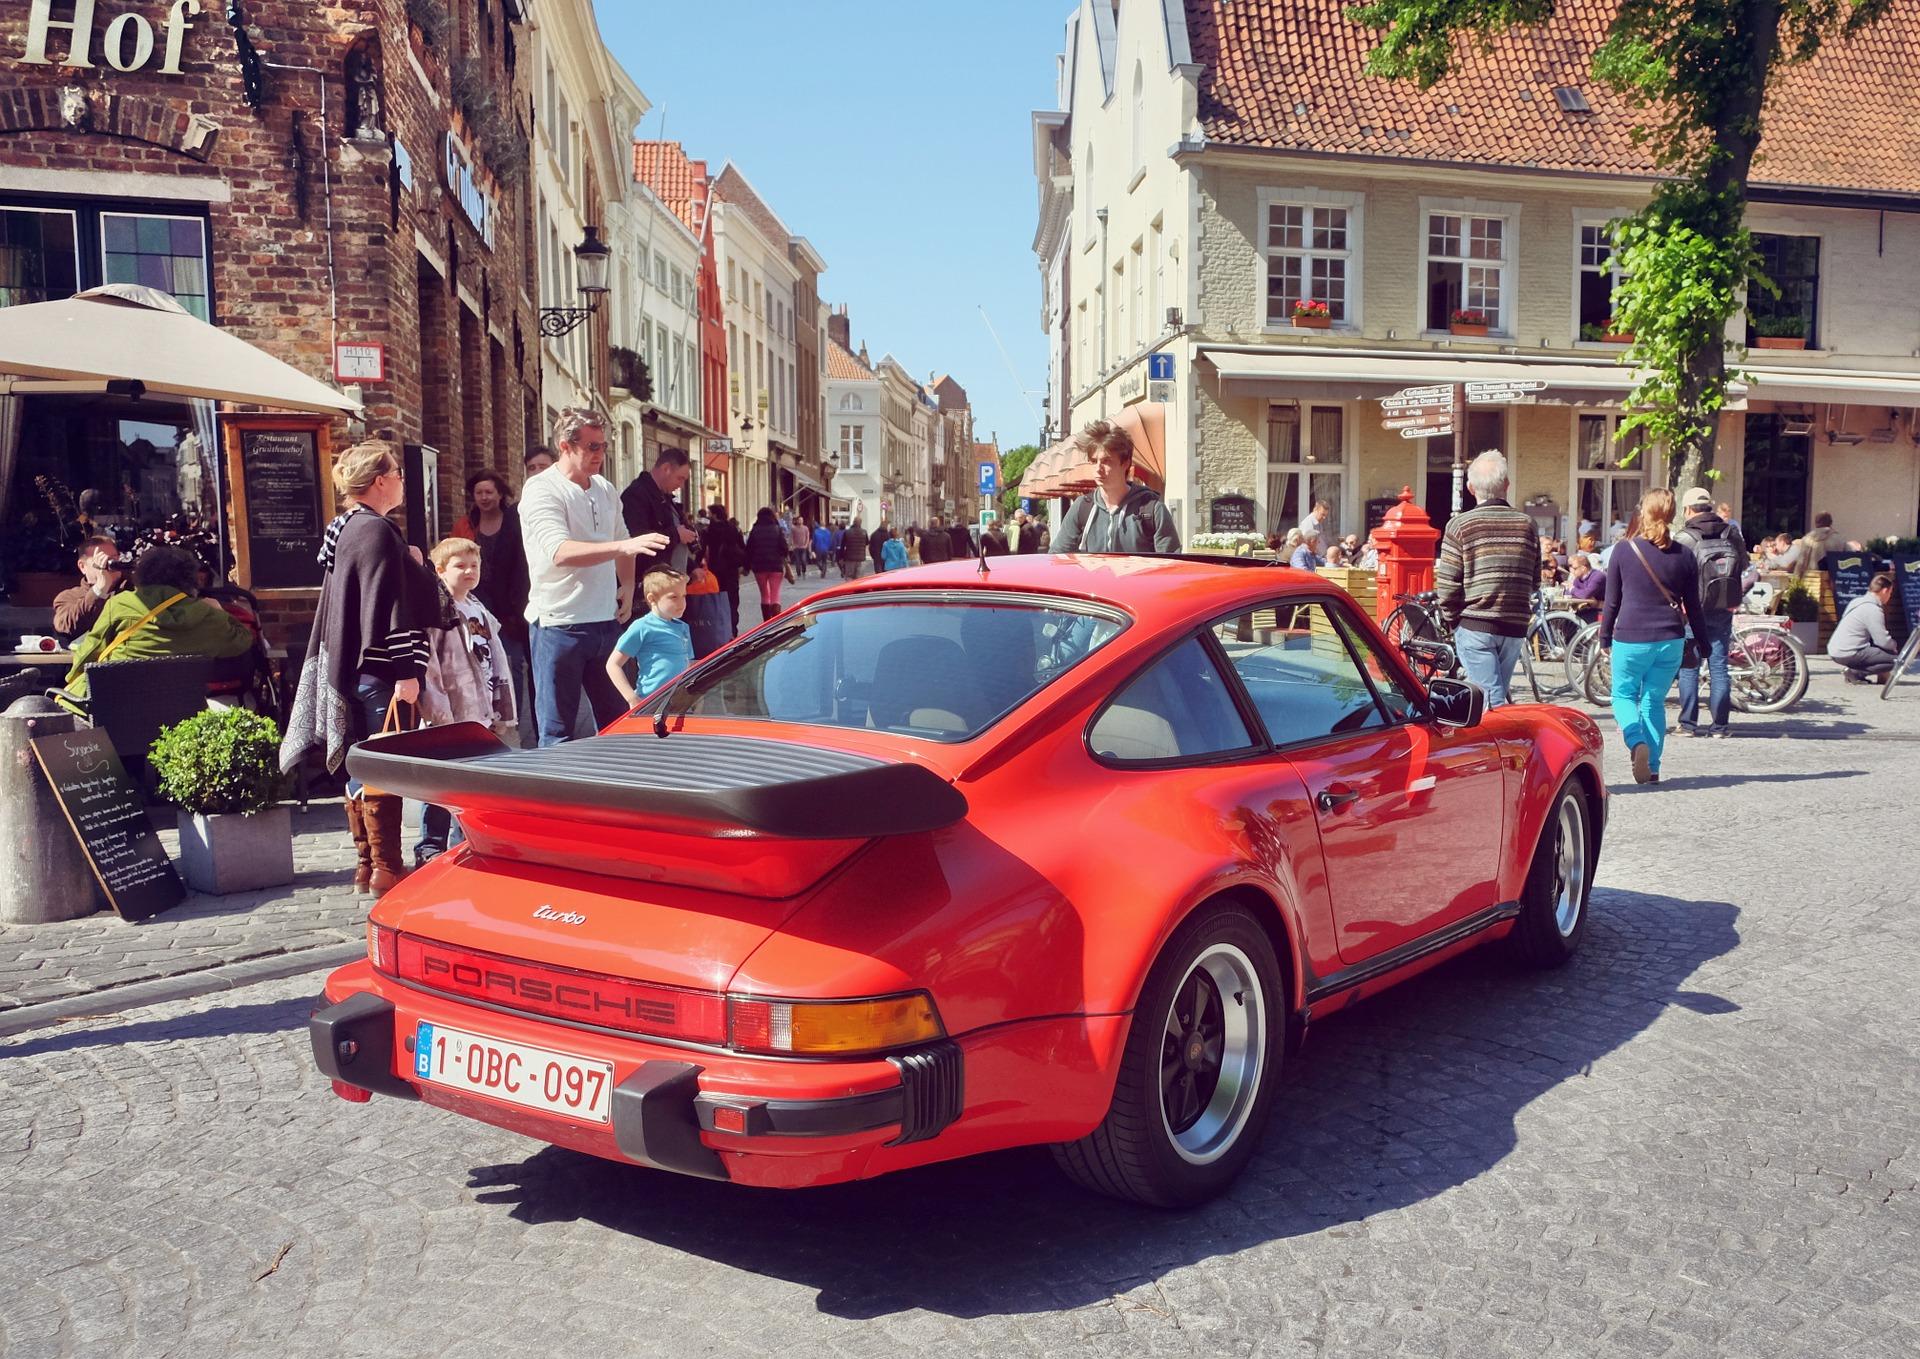 Porsche G-Modell Turbo